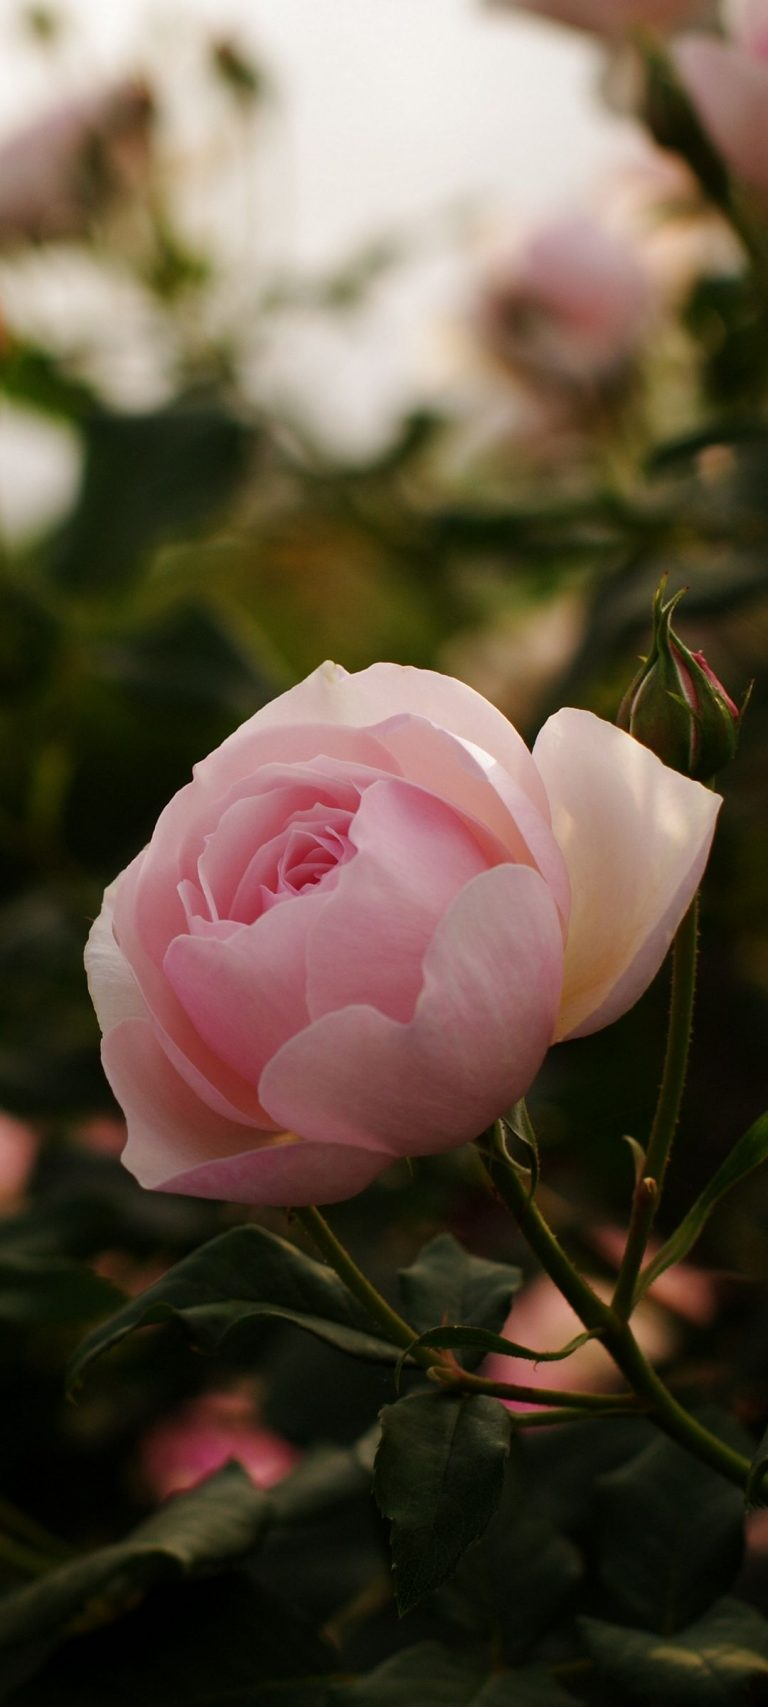 Roses Flowers Bushes Garden 1080x2400 768x1707